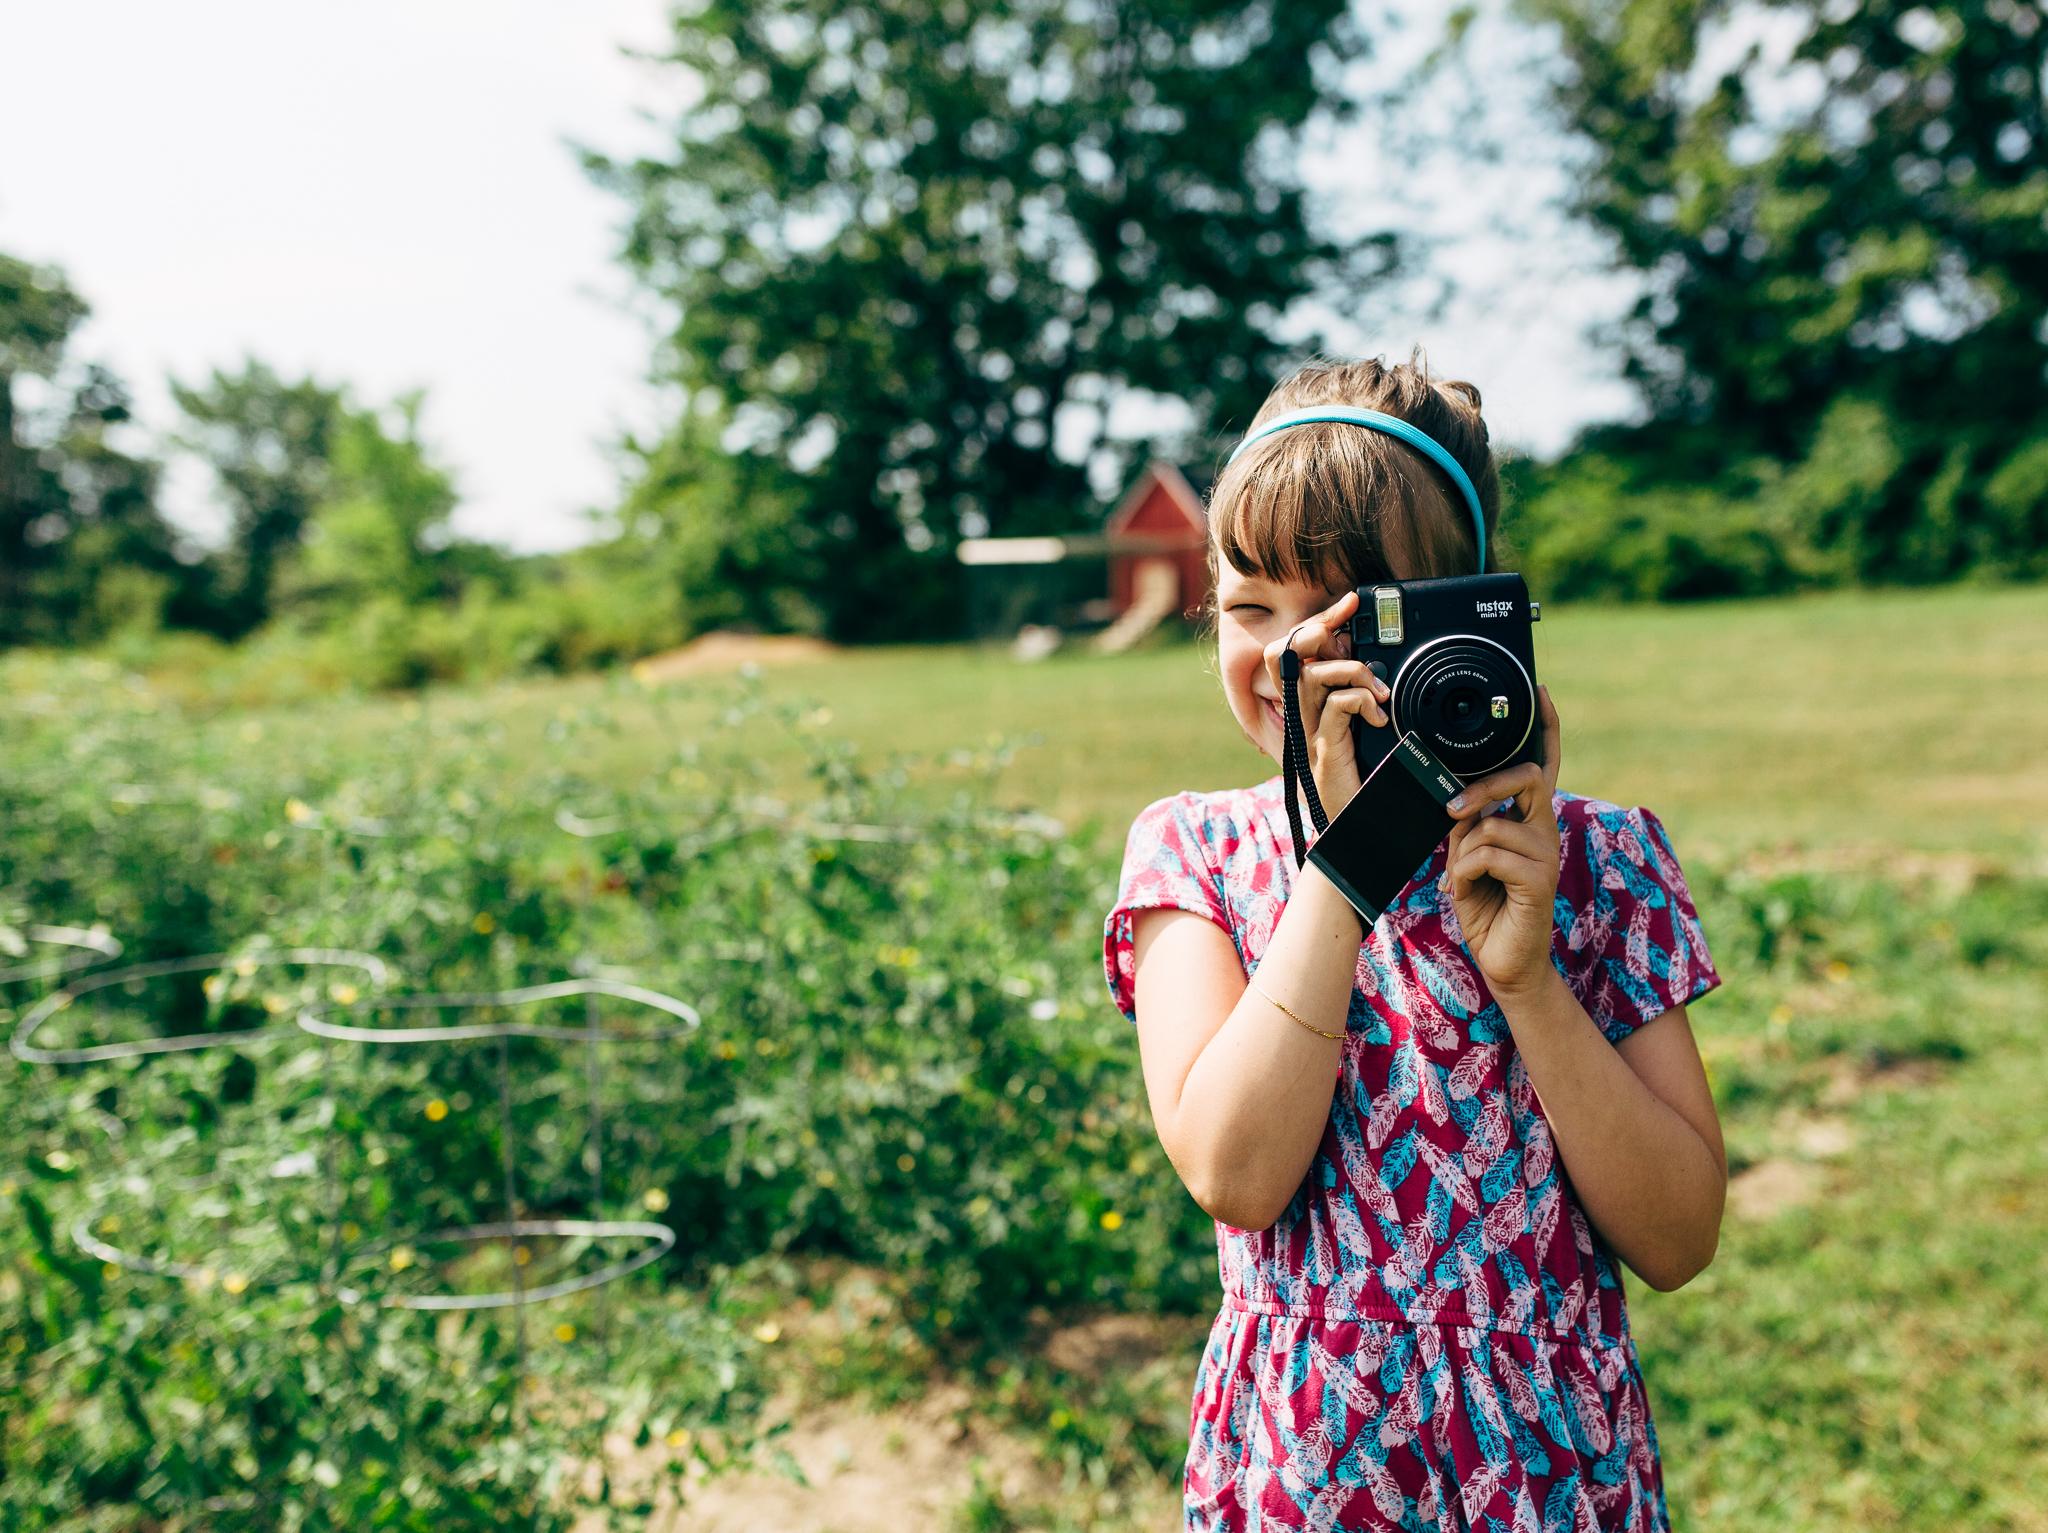 maine-family-photographer-childhood-garden-photography-dayton-saco-biddeford-2.jpg